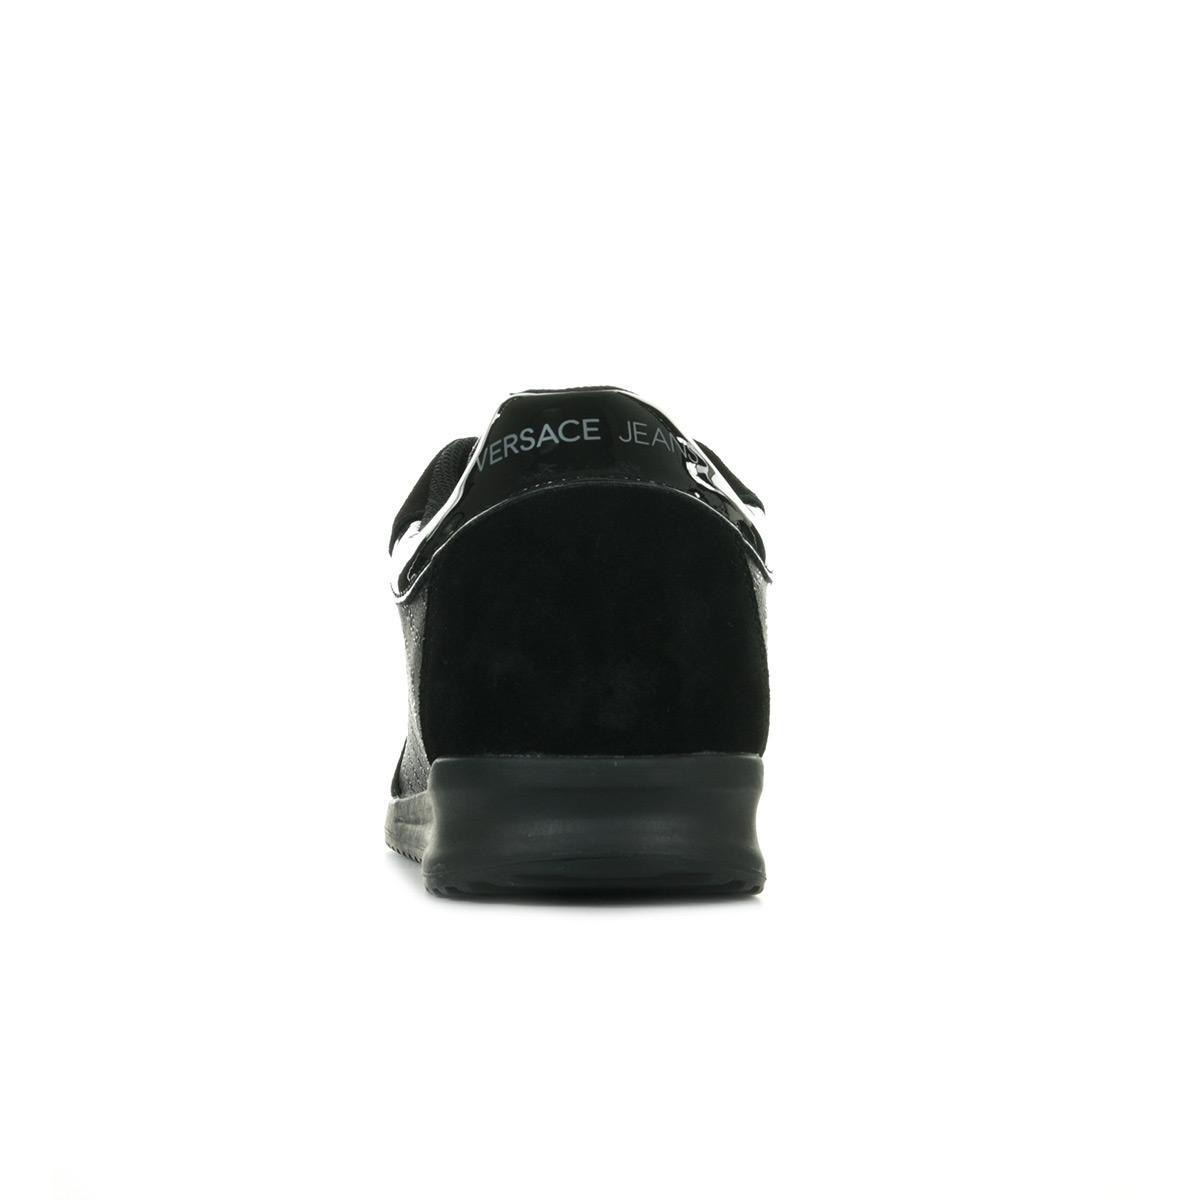 1a8ac352c30ed7 Versace Jeans Linea Fondo Marc Dis. 1 E0YTBSC170747899, Baskets mode ...